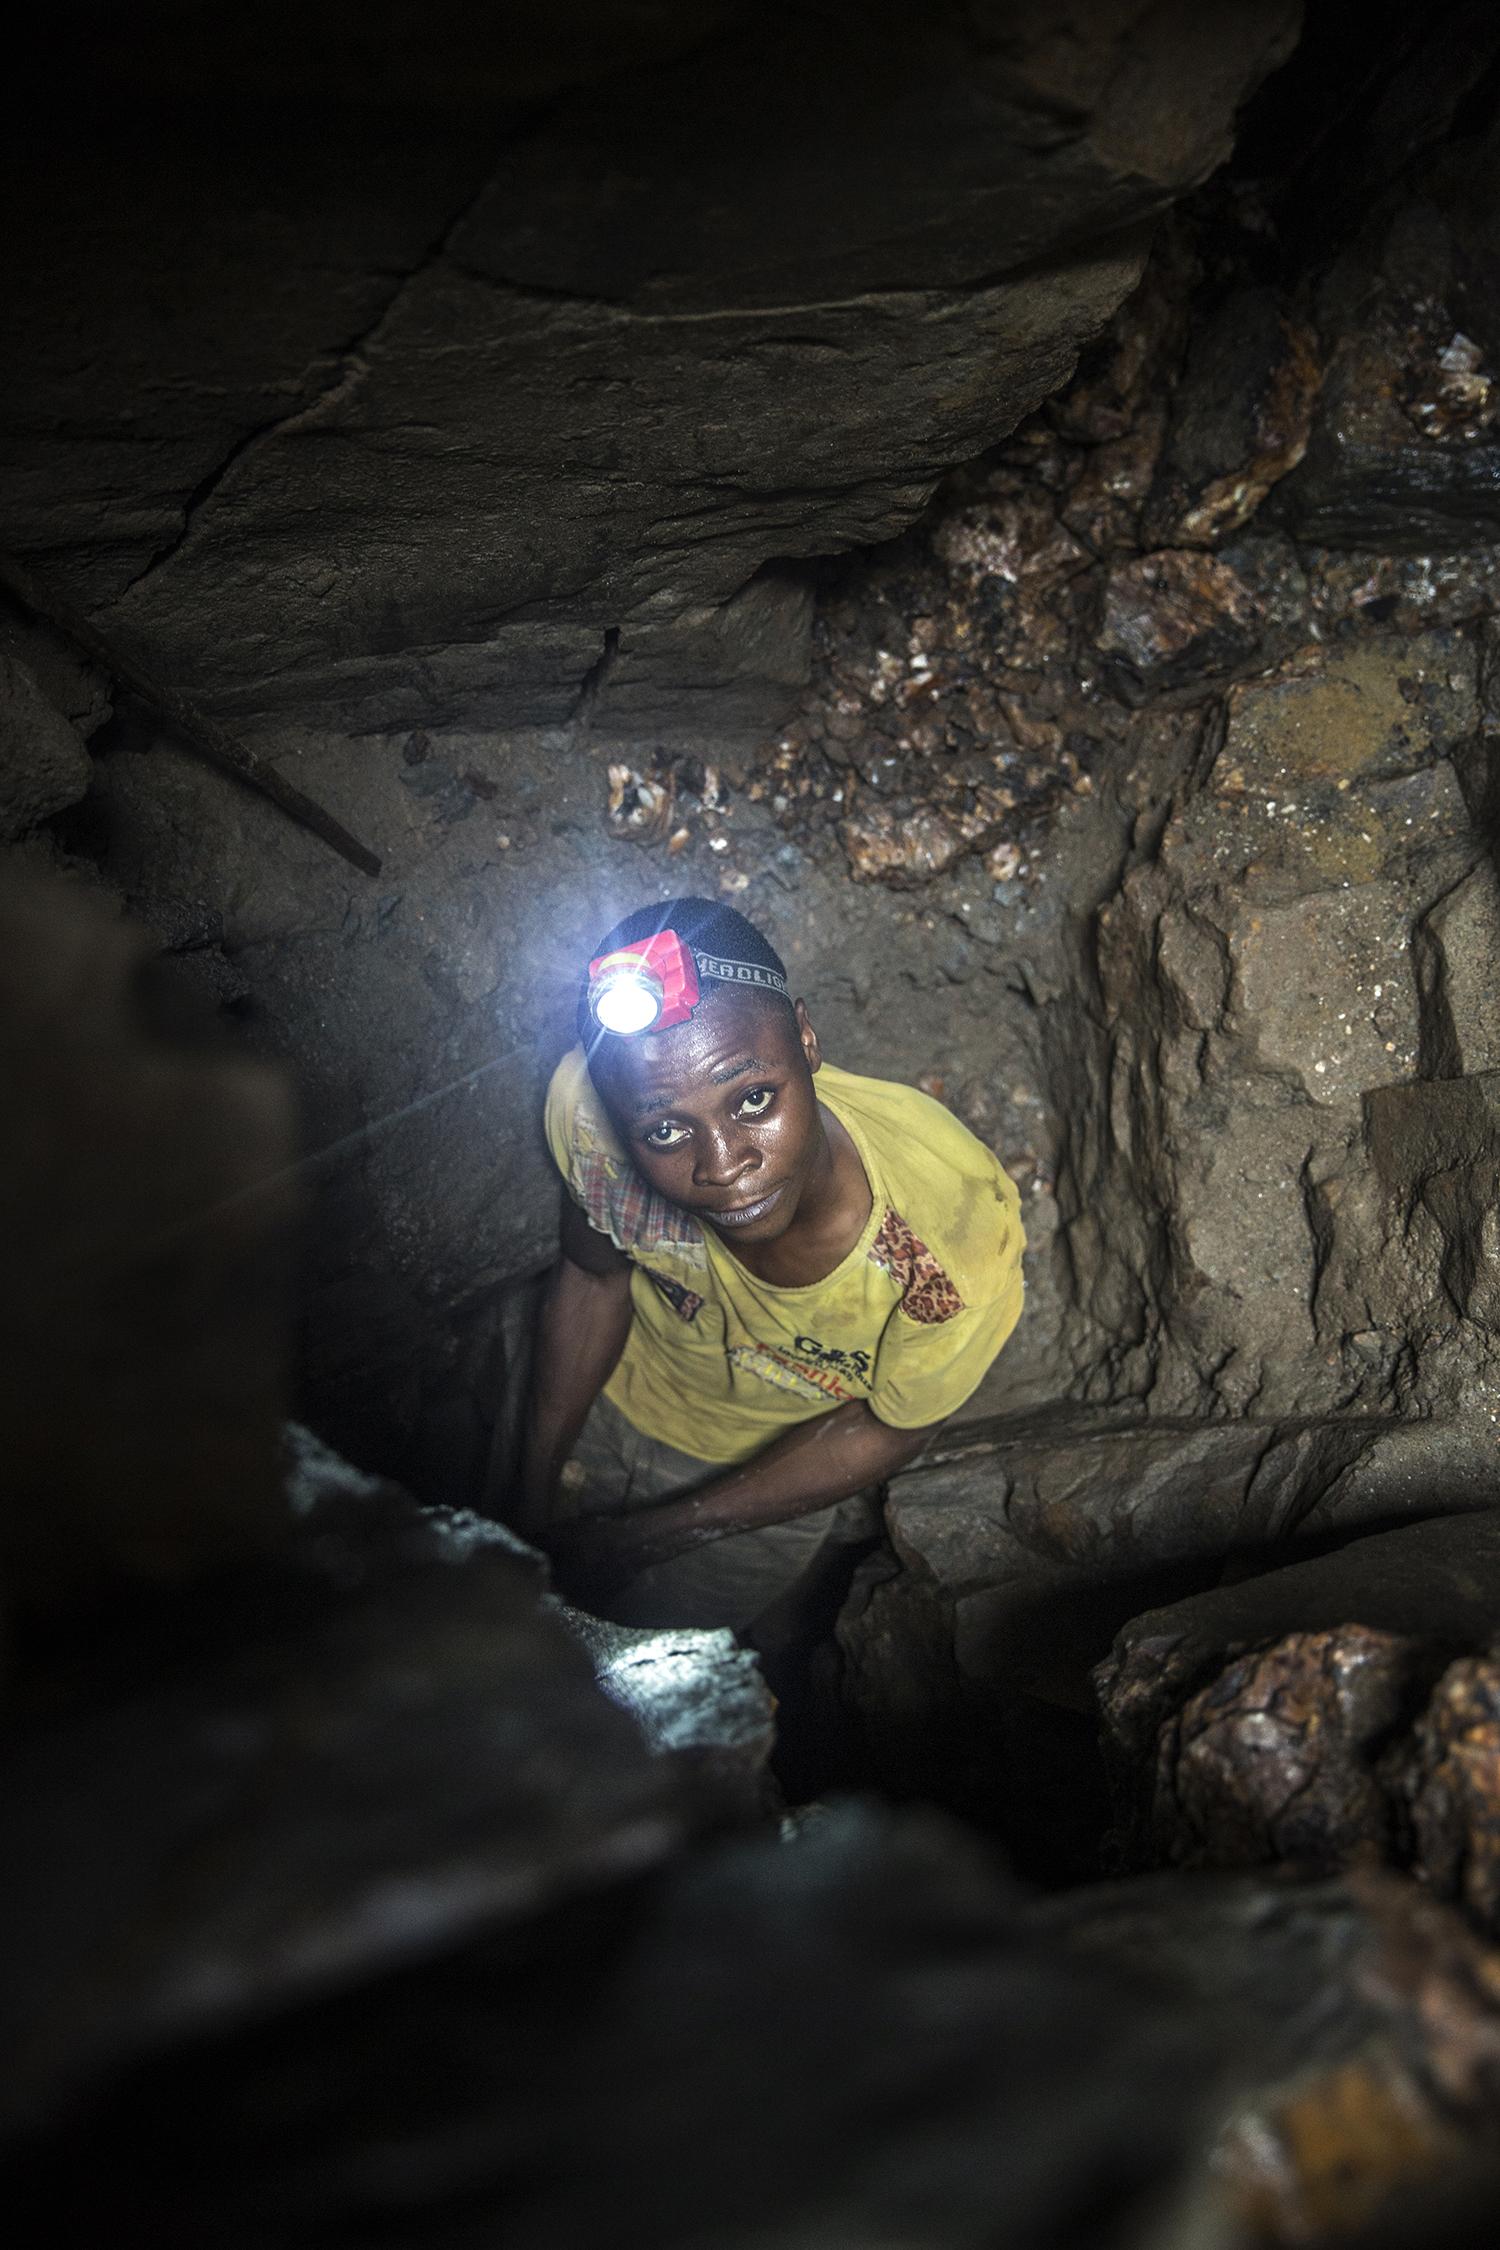 2015_DRC_Congo_conflict_minerals_07.jpg